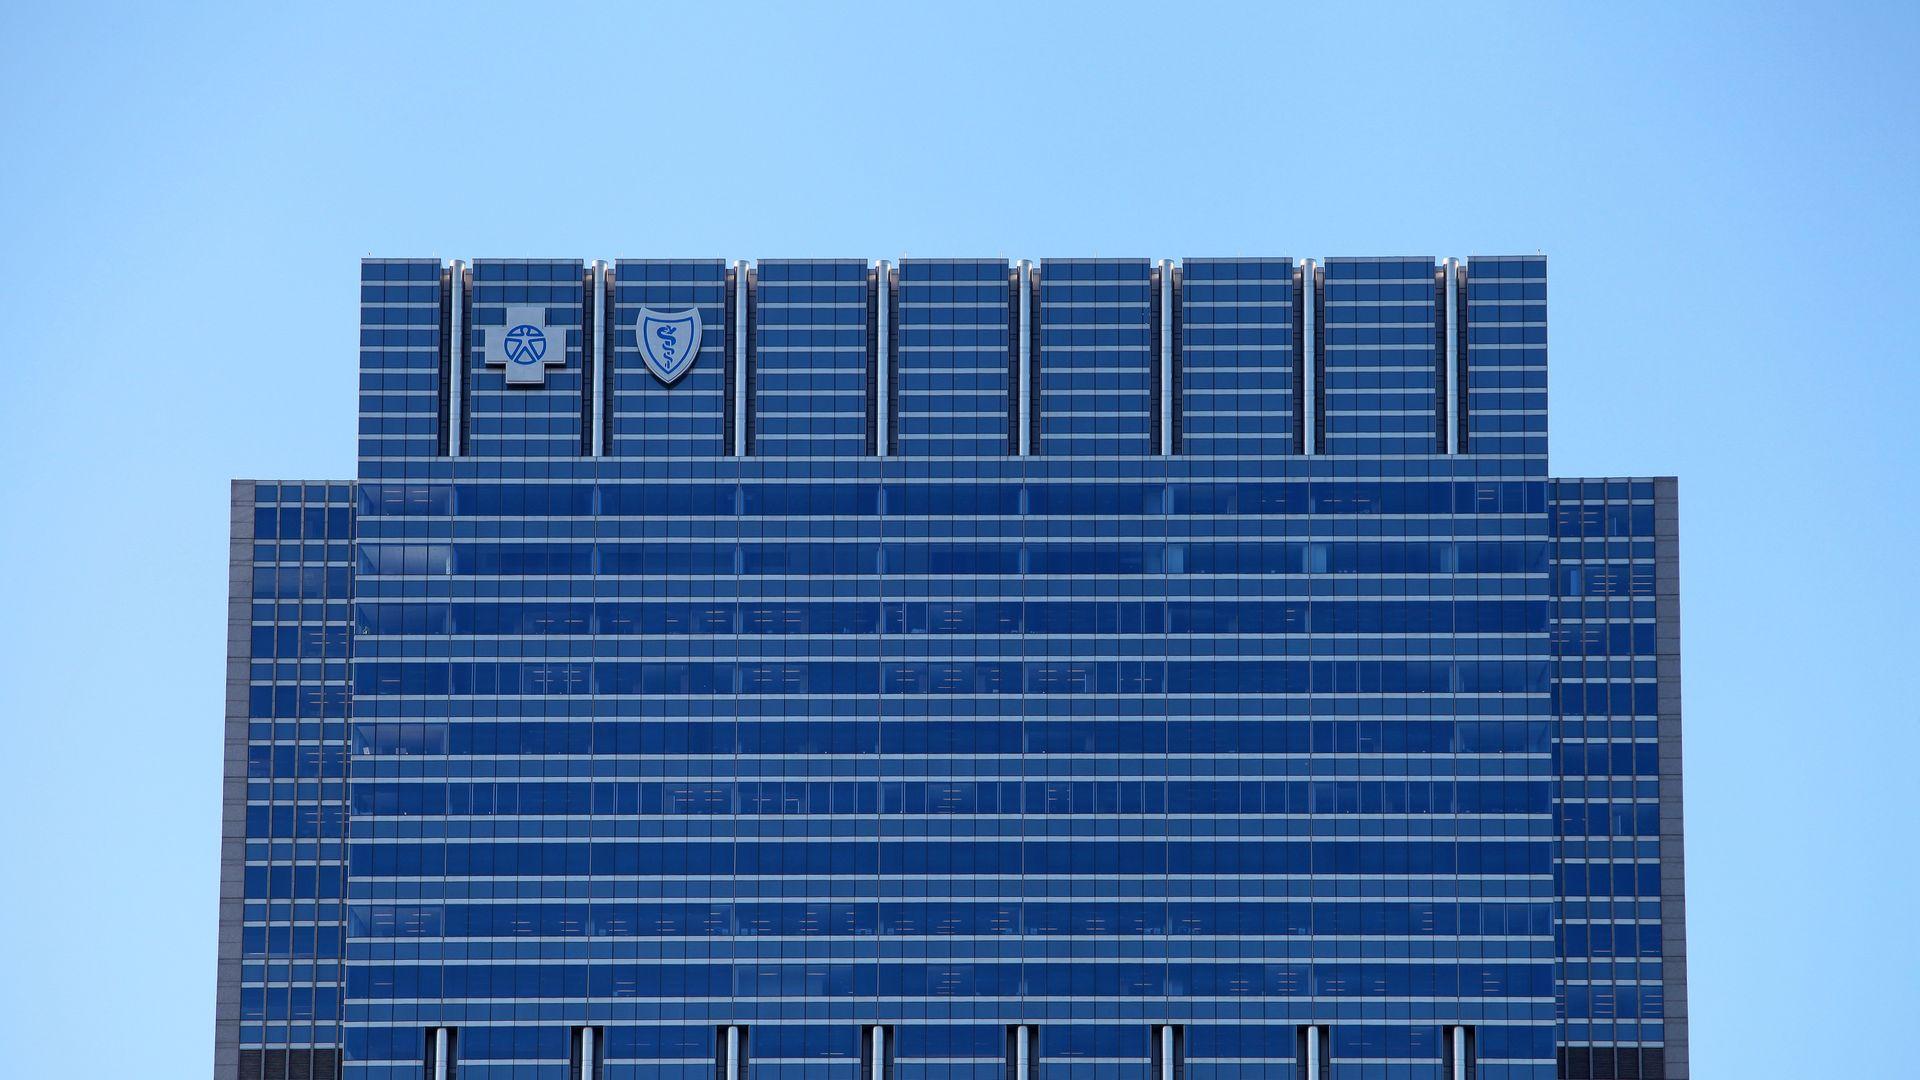 Blue Cross Blue Shield building